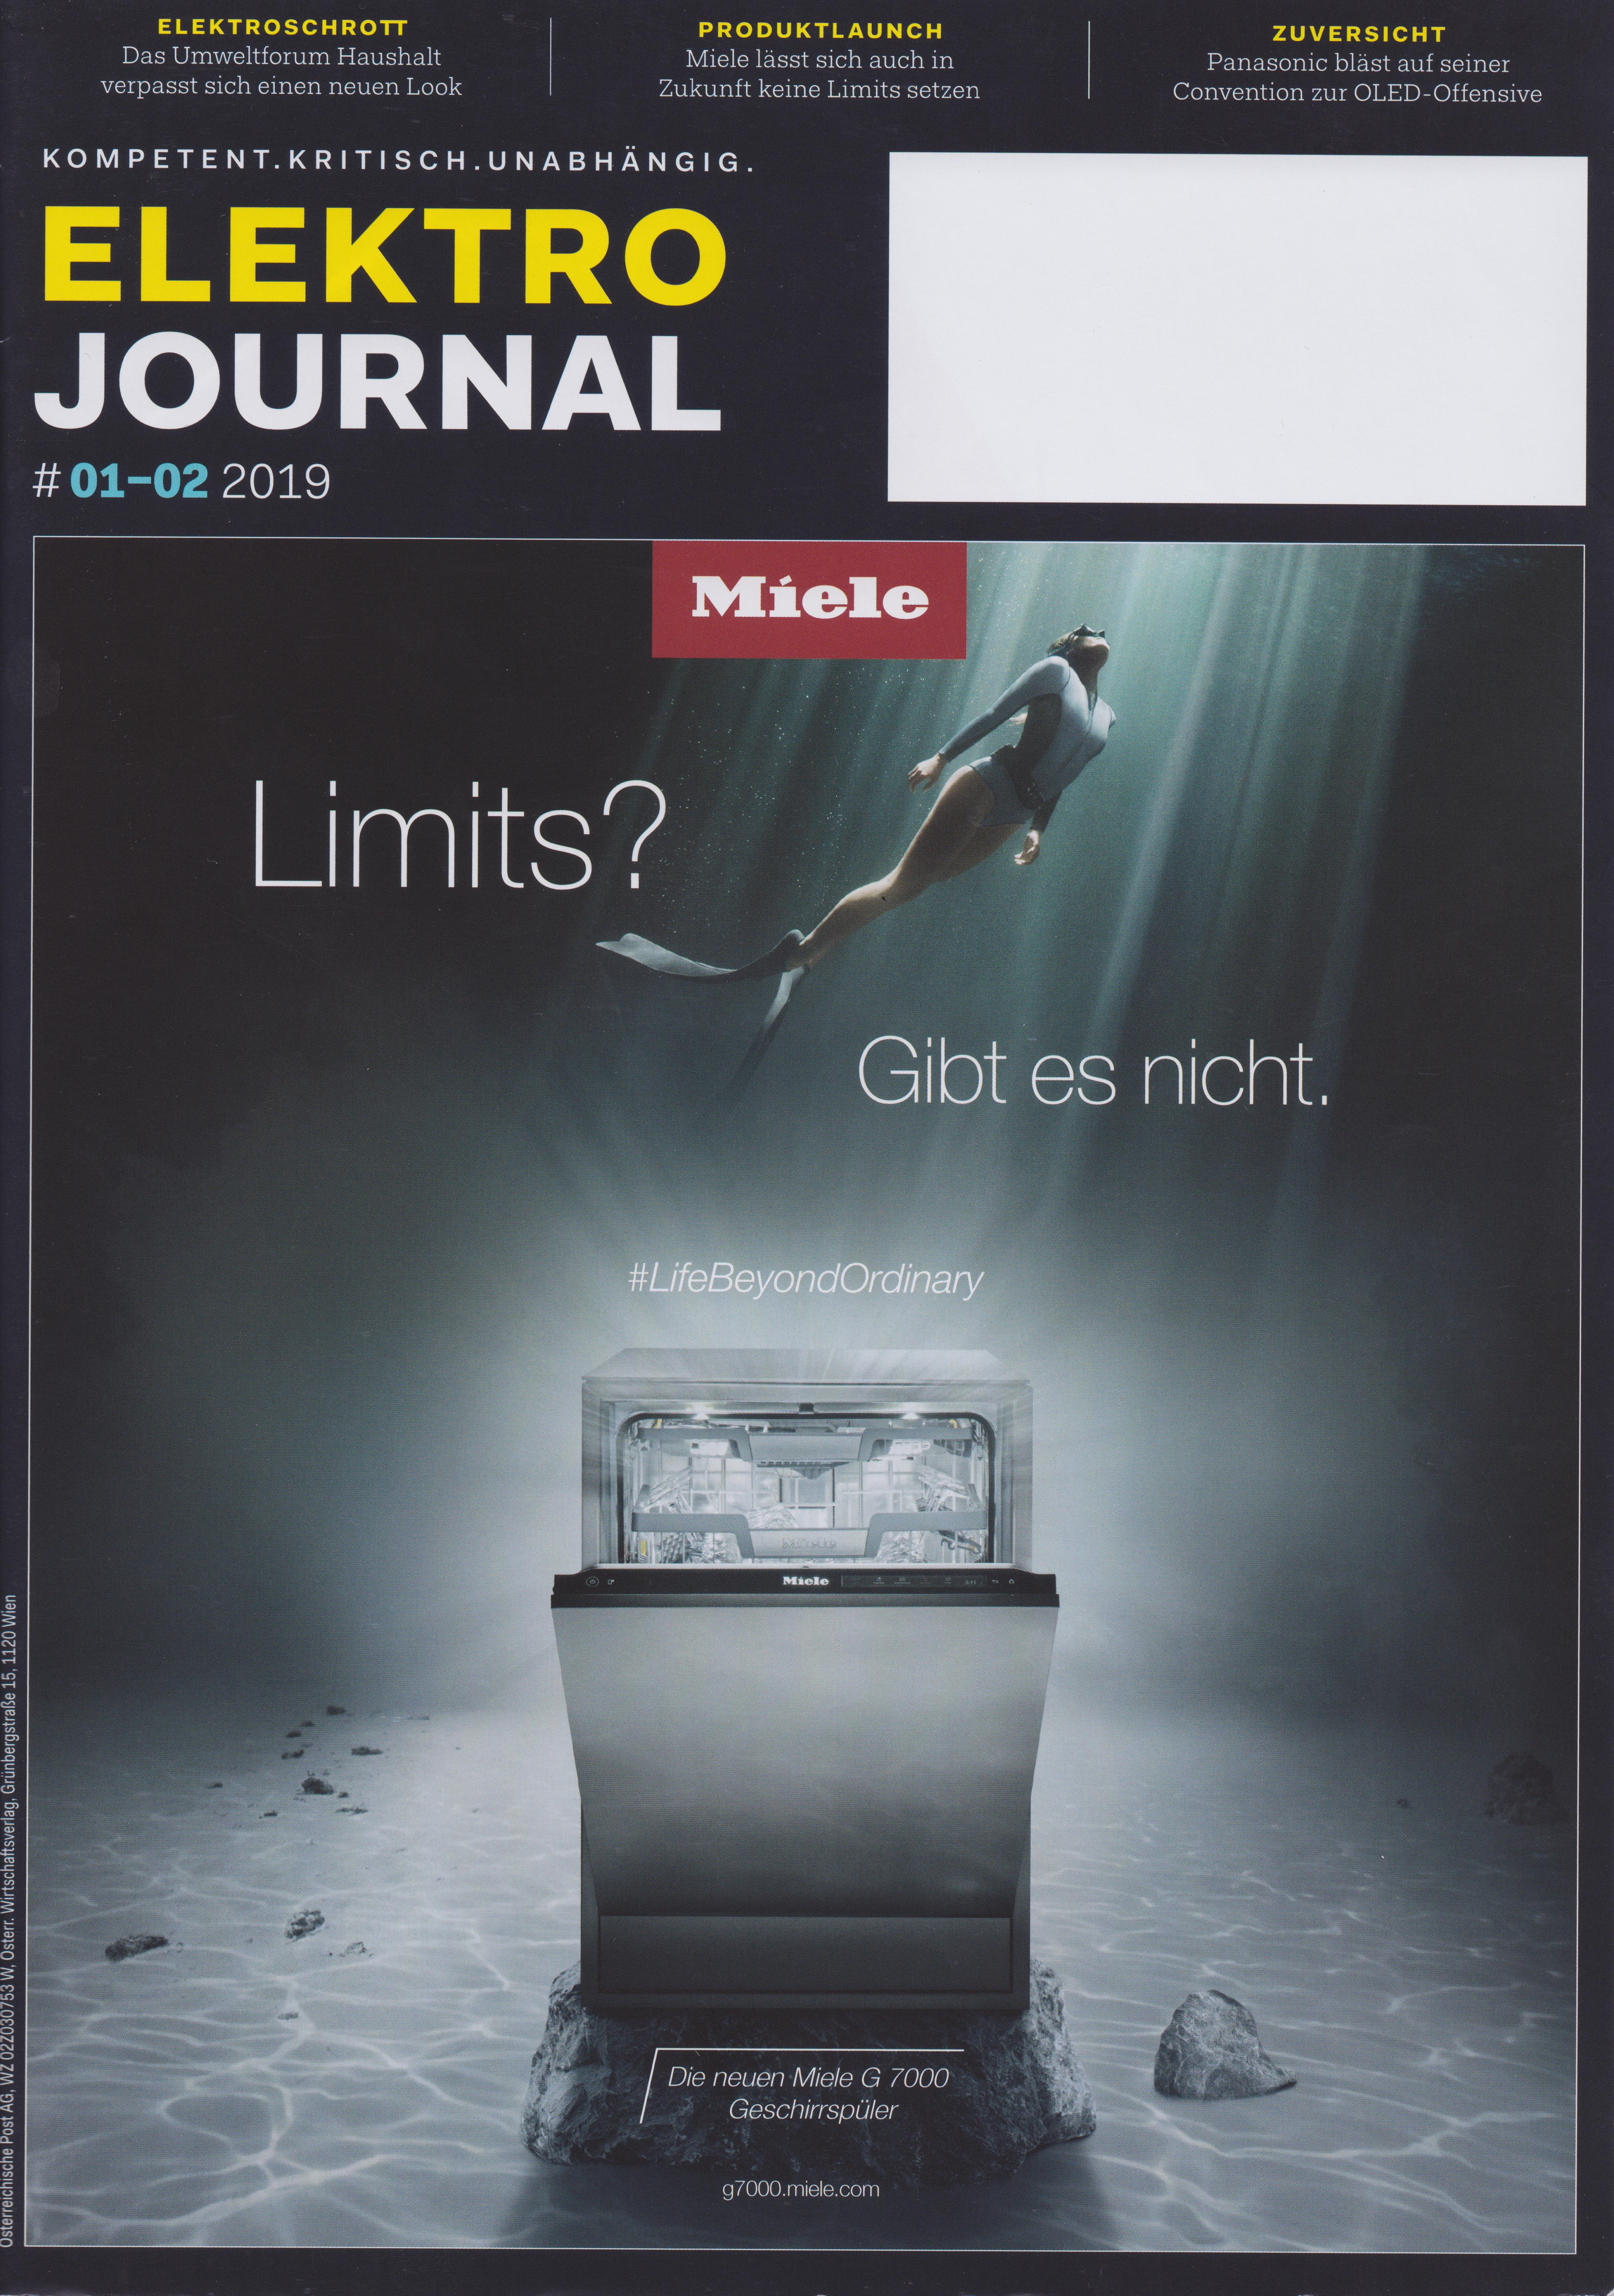 Elektrojournal 01-02 2019 - Cover - Mag. Roman Kmenta